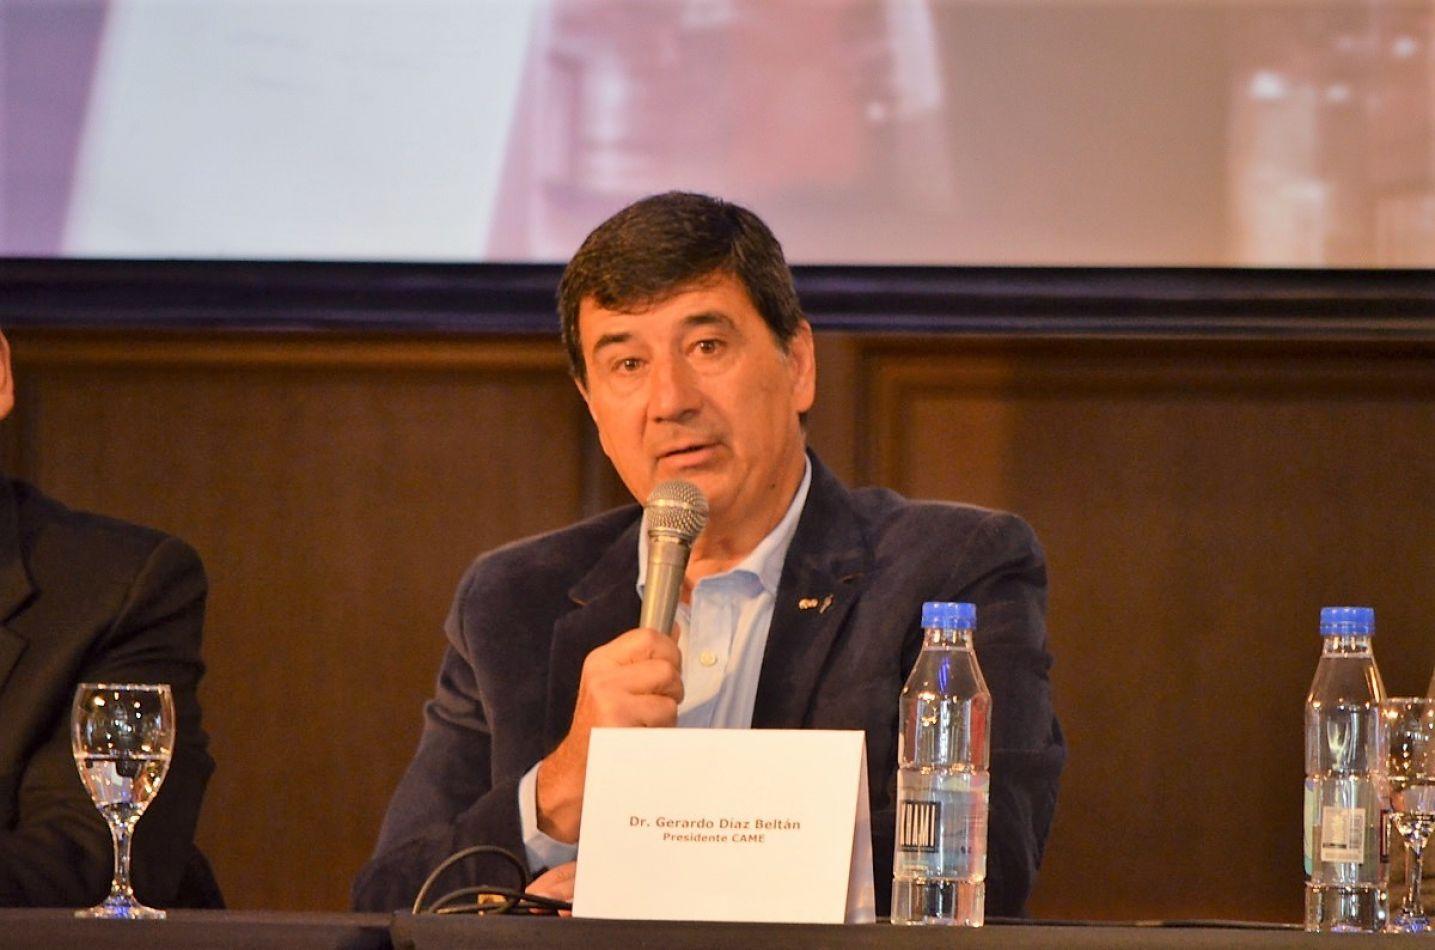 Gerardo Díaz Beltrán, presidente de la CAME,